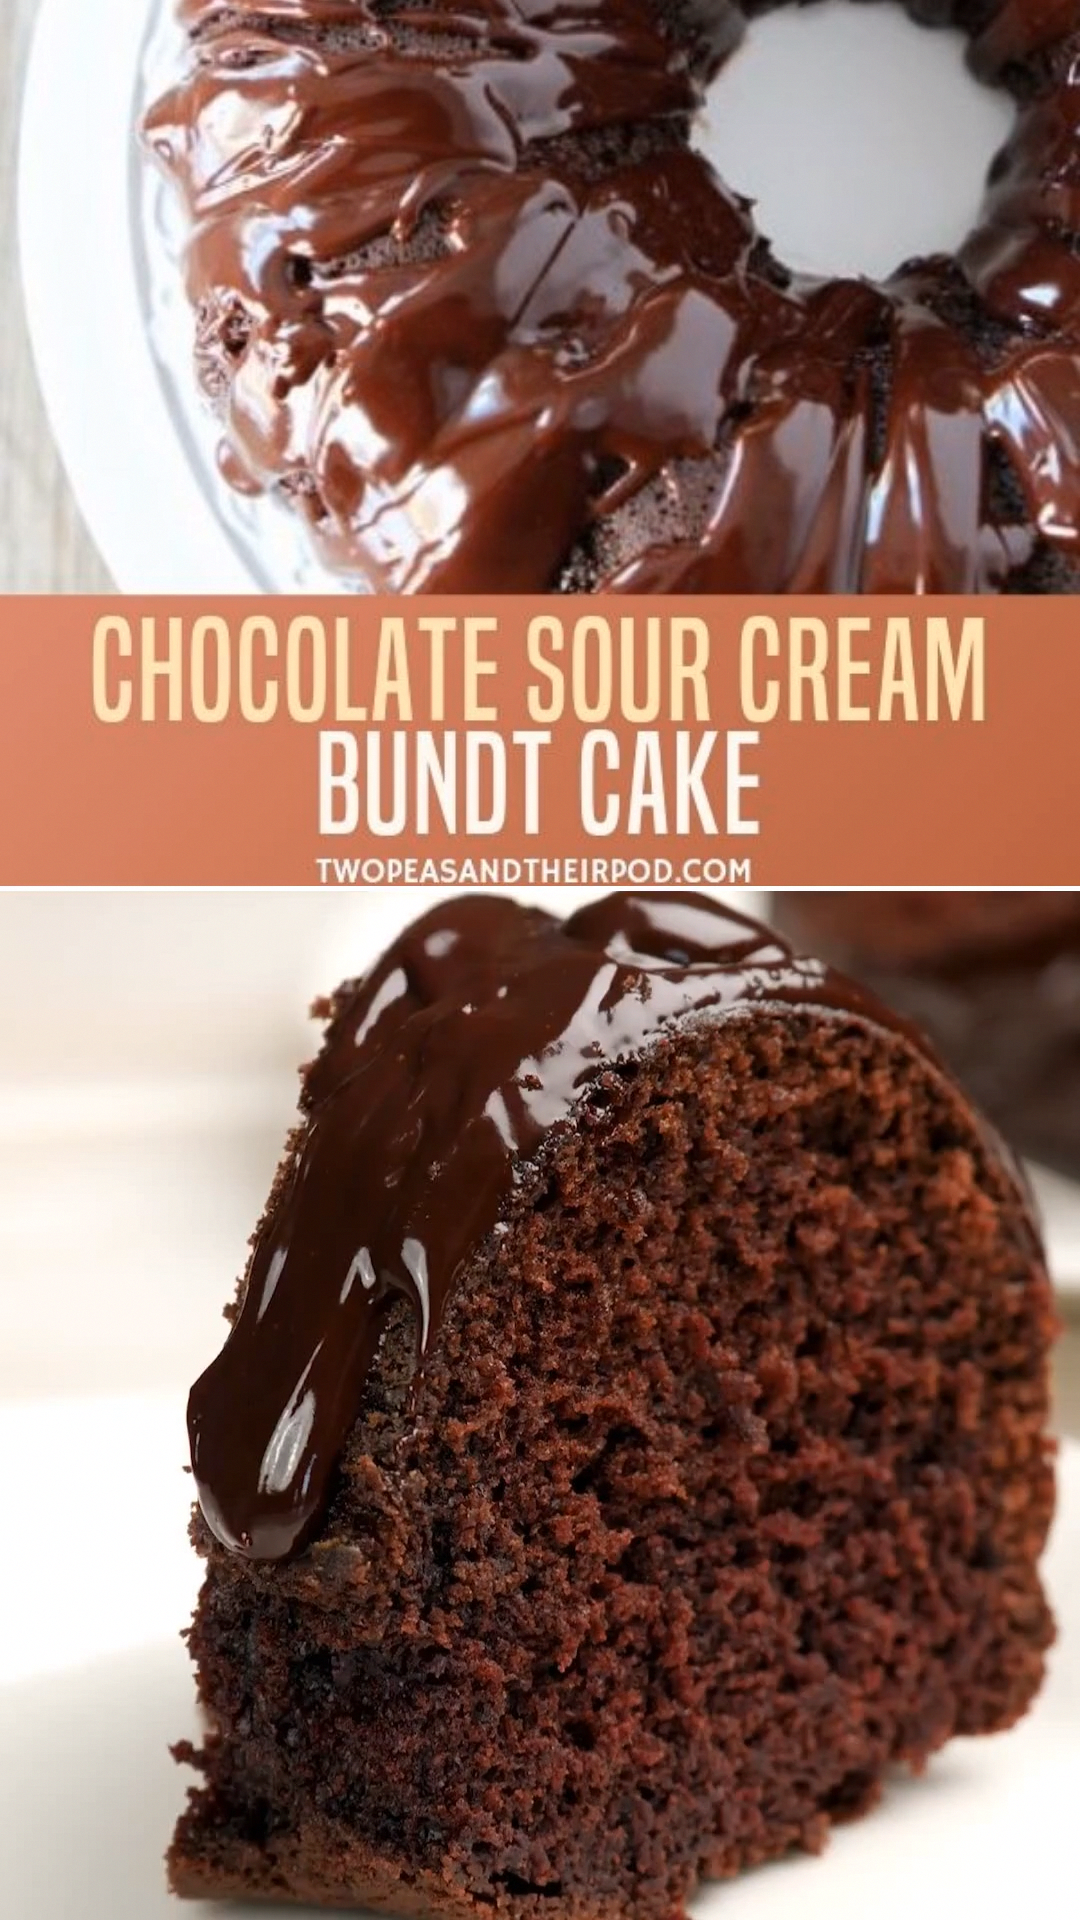 Pear Pudding Hq Recipes Recipe In 2020 Homemade Chocolate Cake Homemade Chocolate Easy Cake Recipes